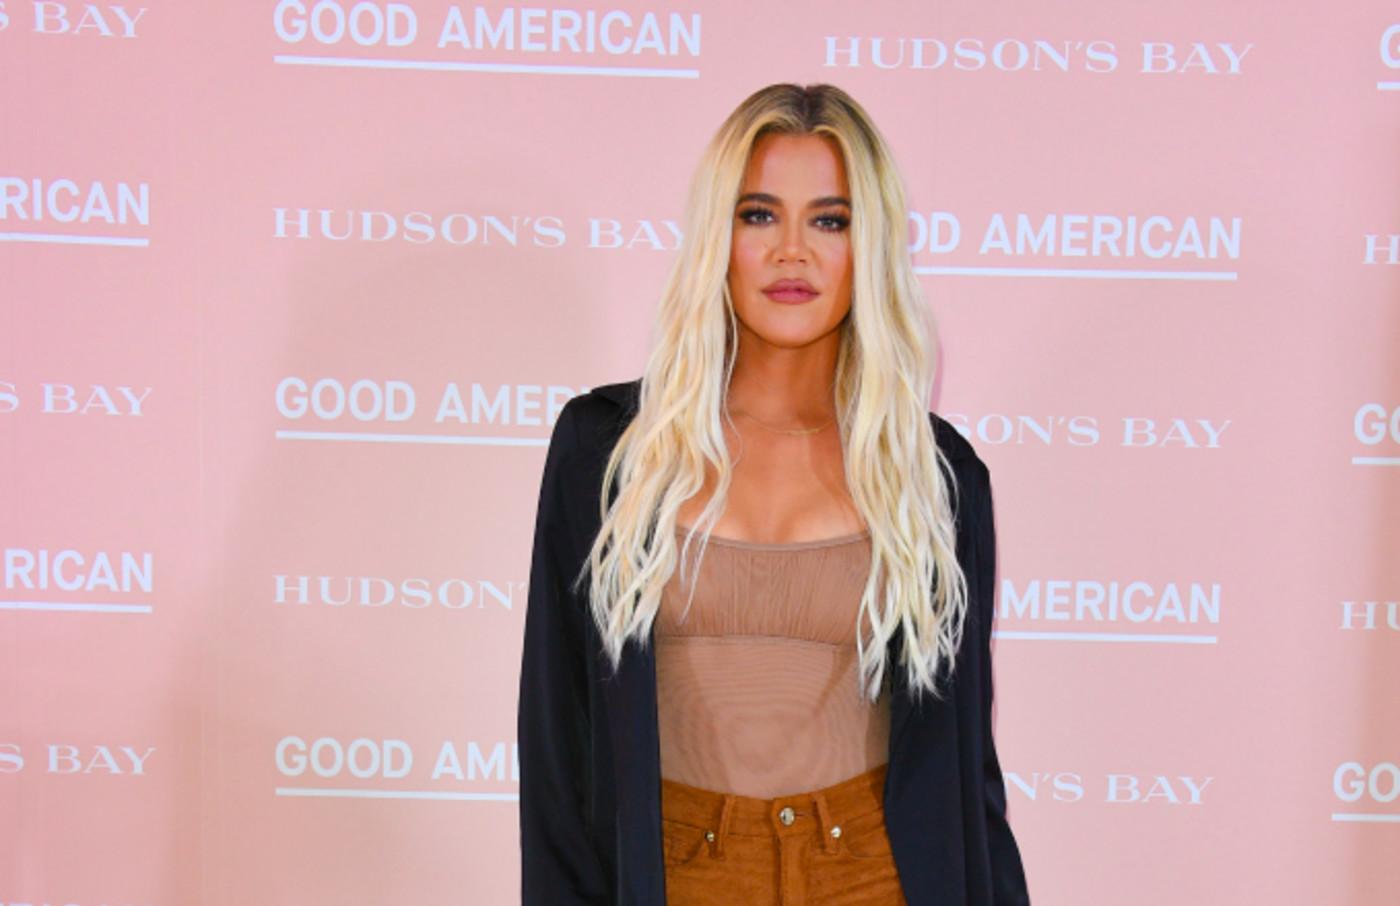 Khloe Kardashian attends Hudson's Bay's launch of Good American